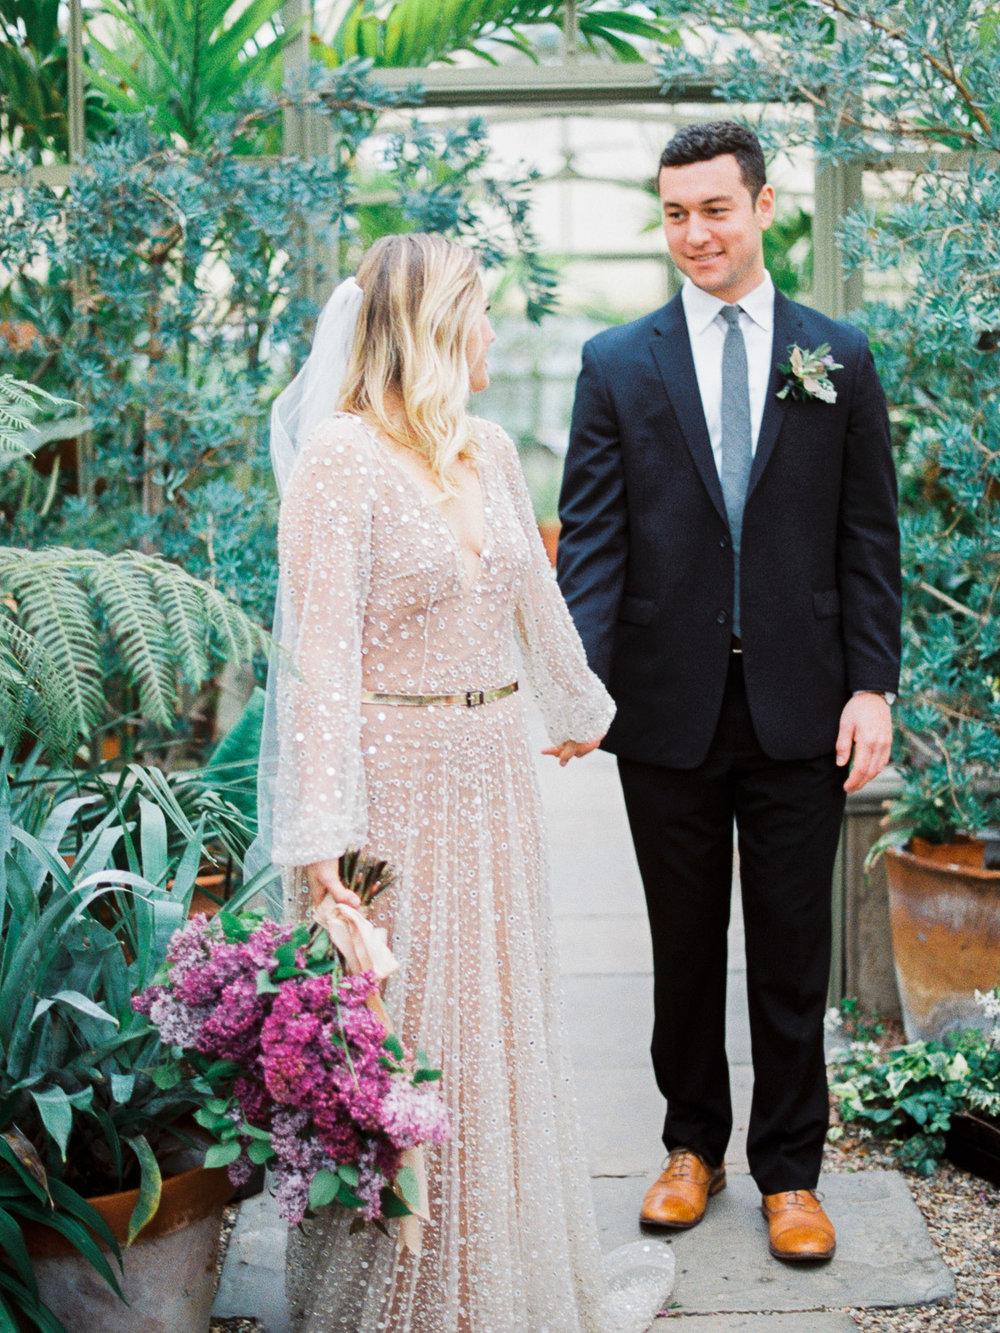 christinadavisphotography+romantic+greenhouse+jardindebuis+styledshoot03.jpg